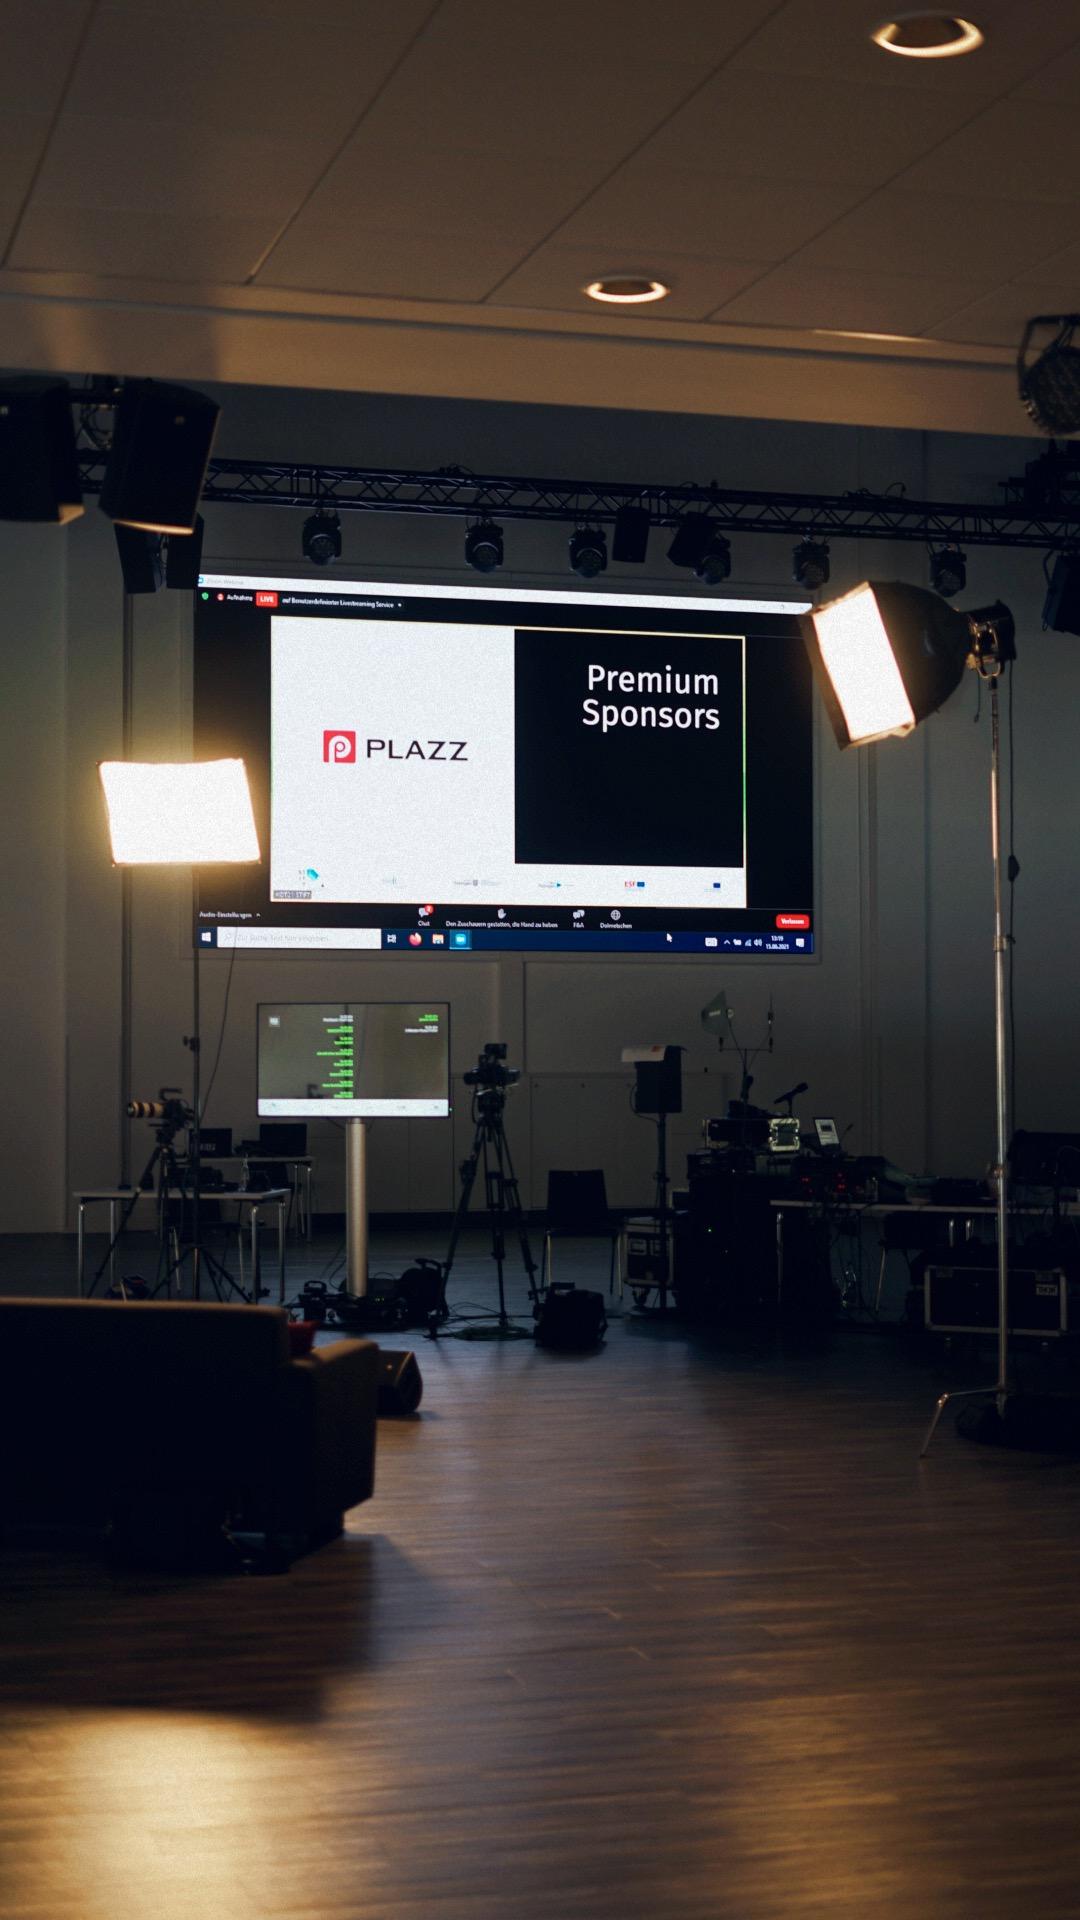 Bilder Investor Days Thueringen - 05